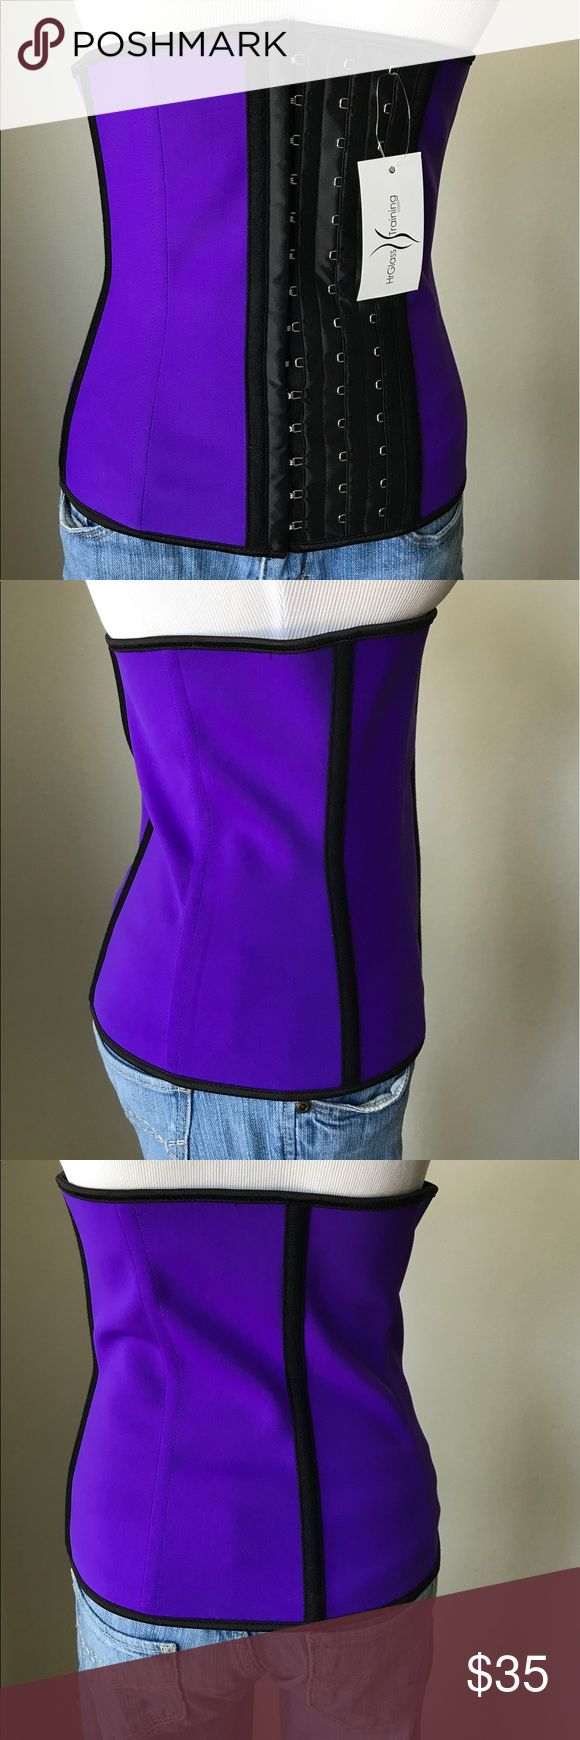 Clip zip waist trainer perfect floral design waist training cinchers - Hrglass Training Best Waist Trainer Corset Nwt